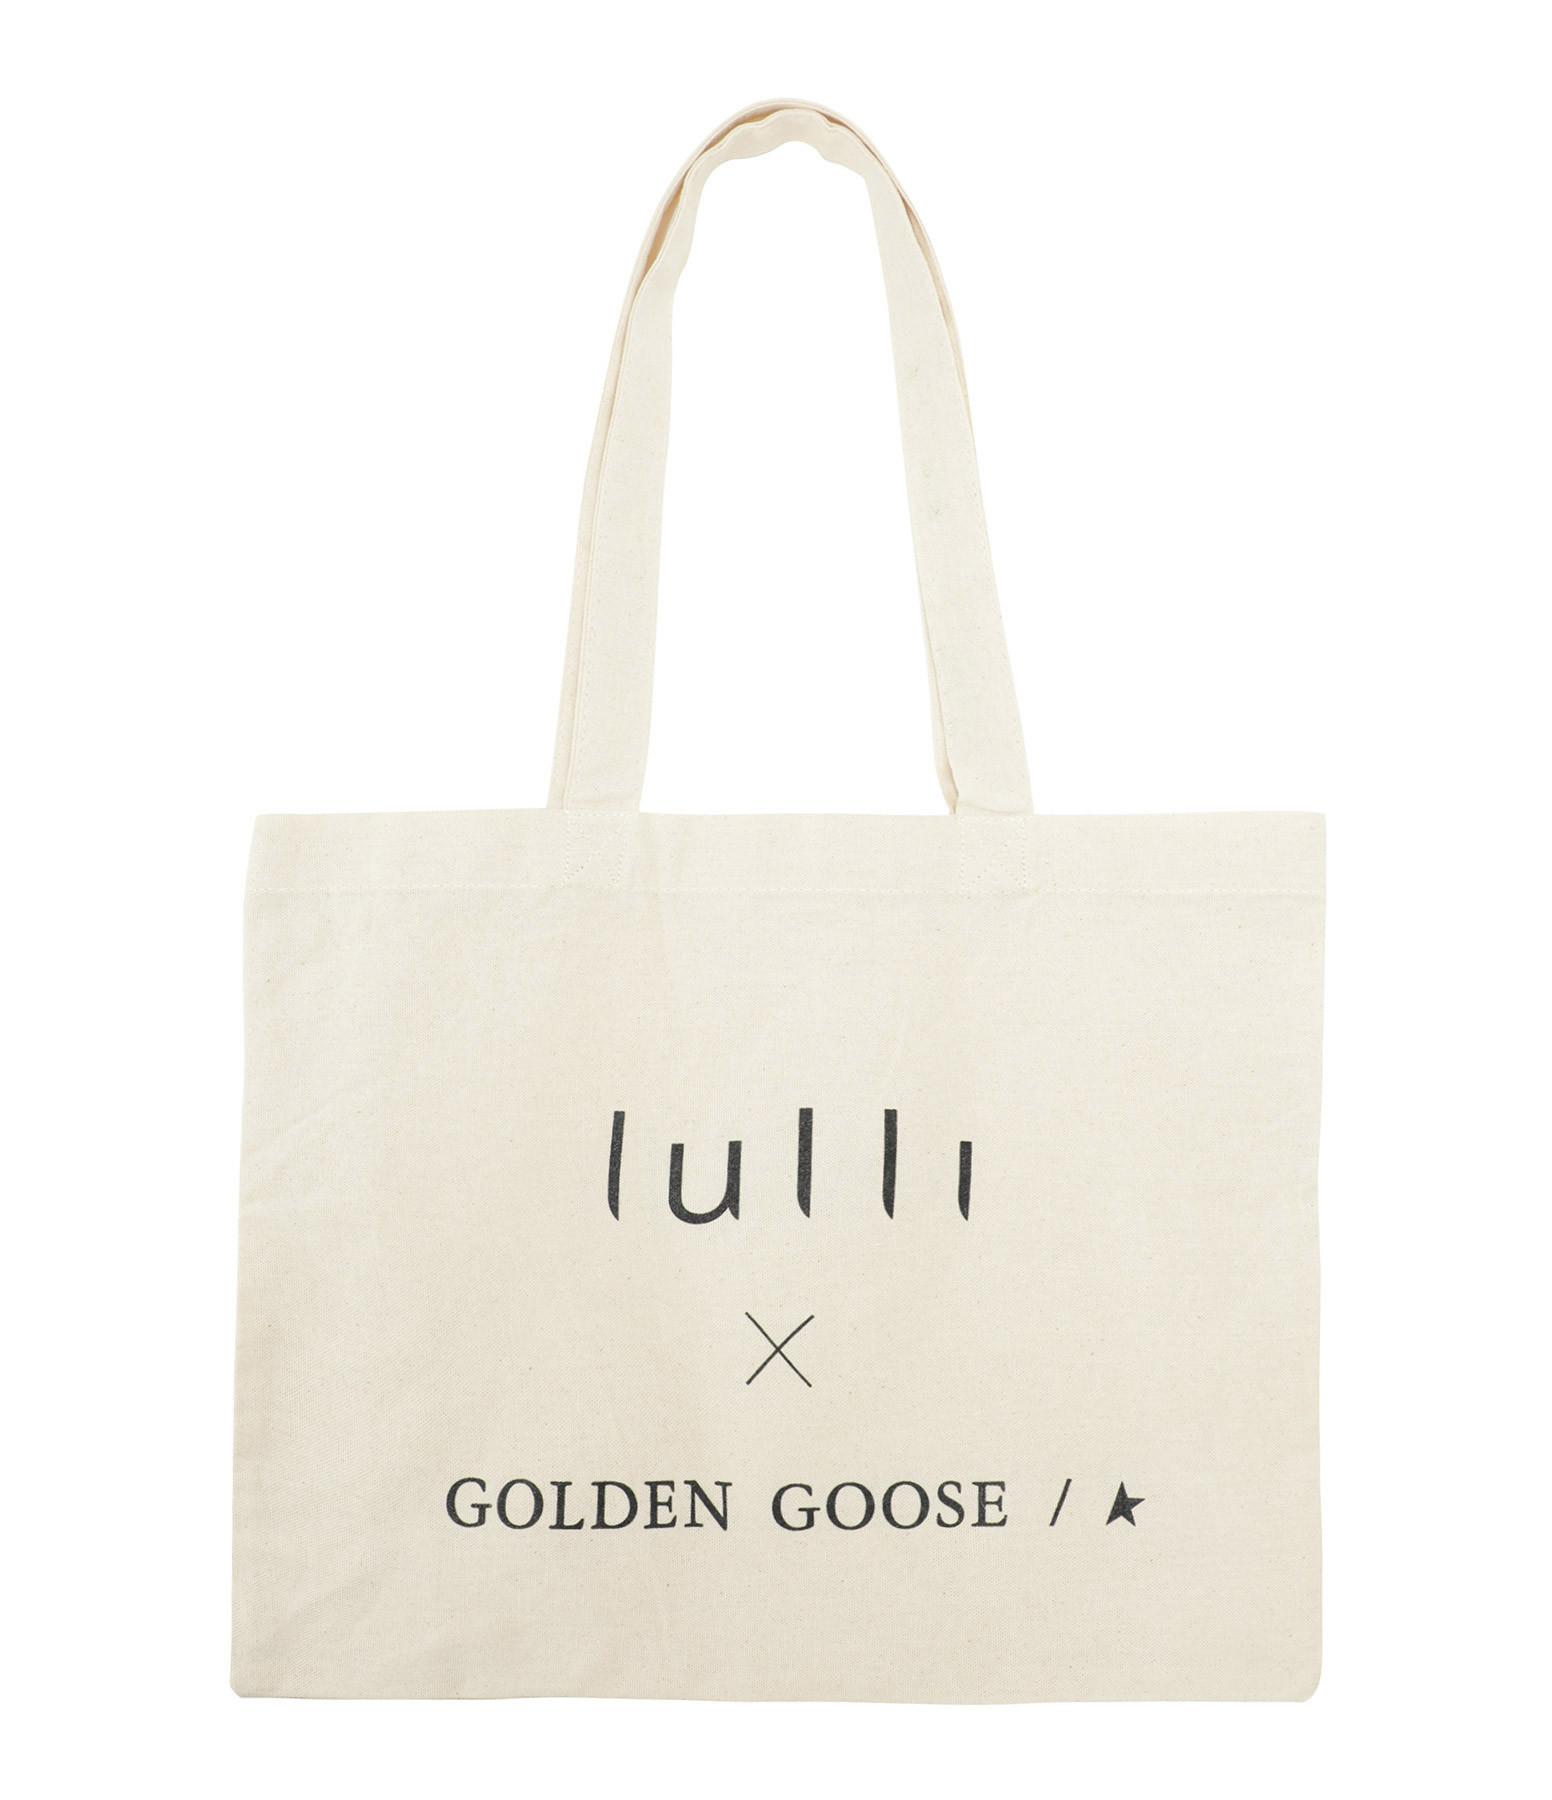 LULLI - Tote bag Lulli Boutique Golden Goose Noir